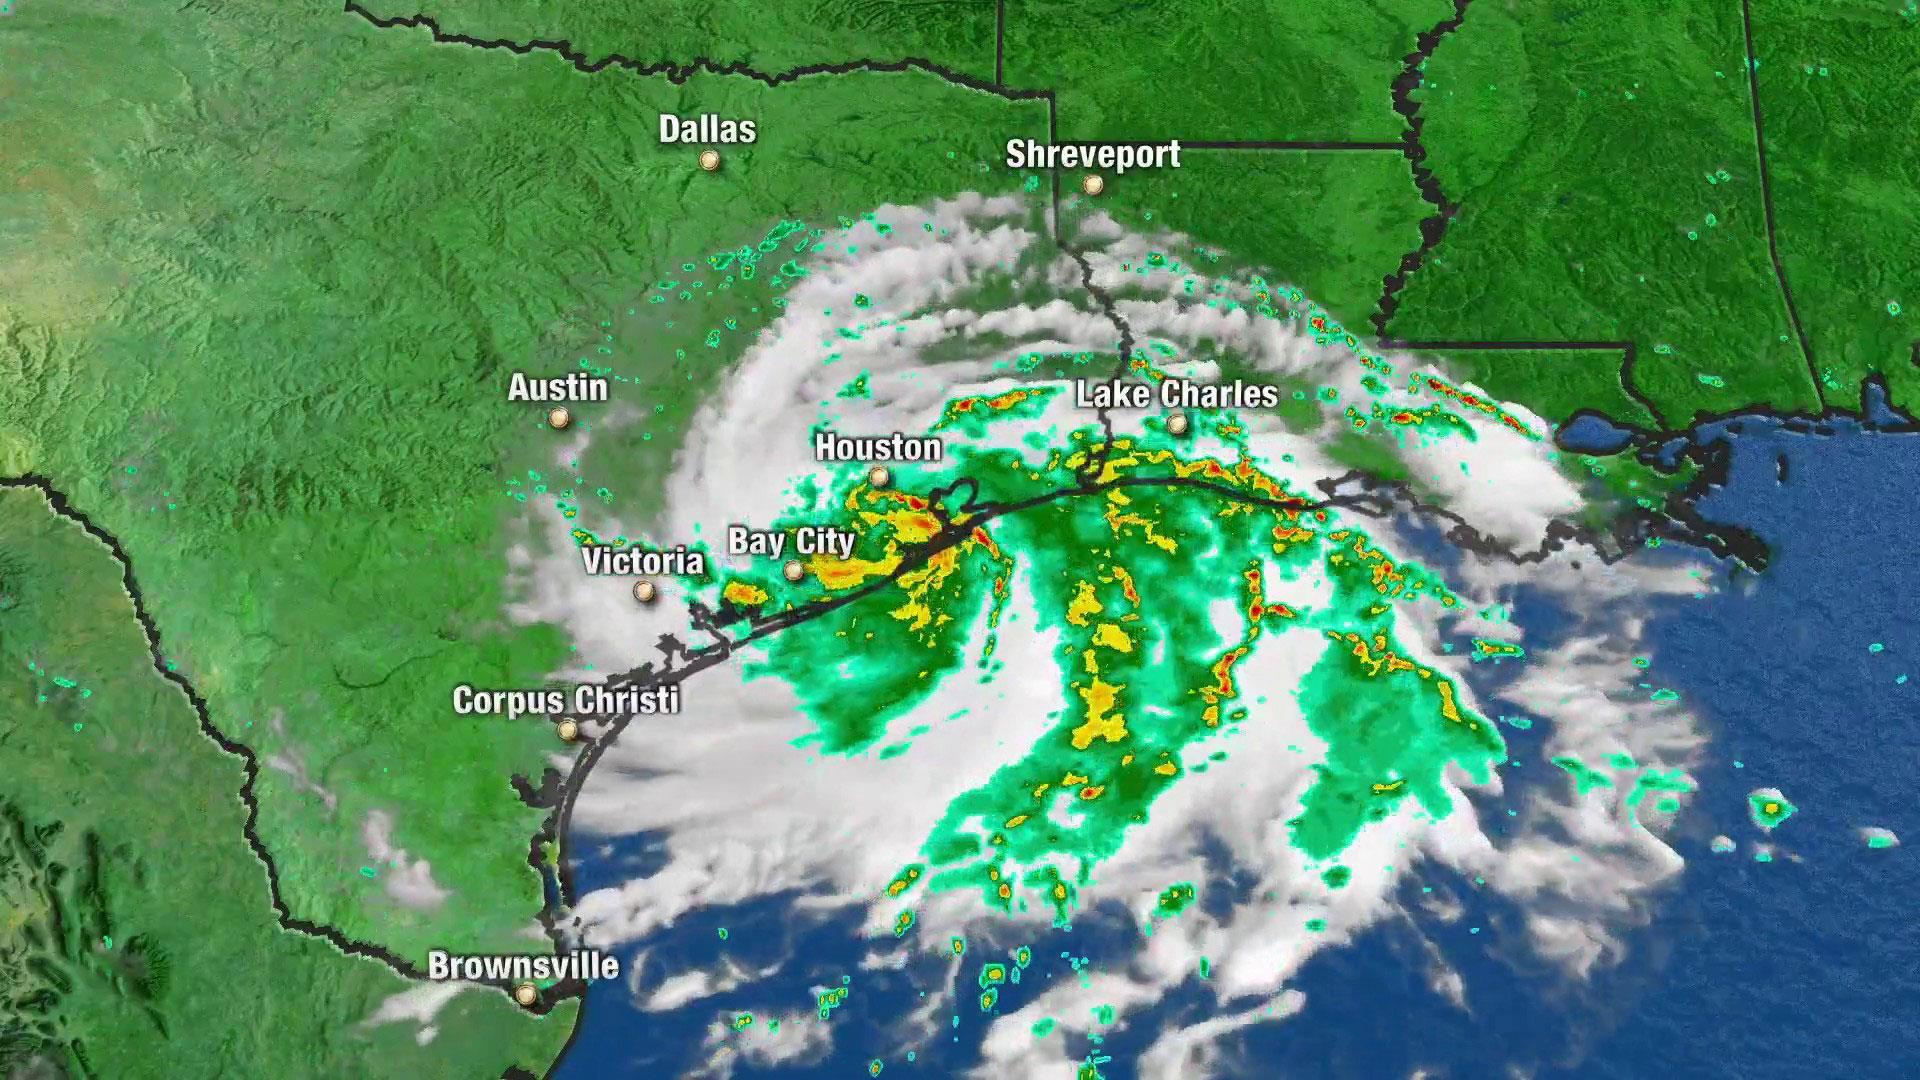 Imelda begins dumping rain on Texas as Hurricane Humberto is upgraded to Category 3